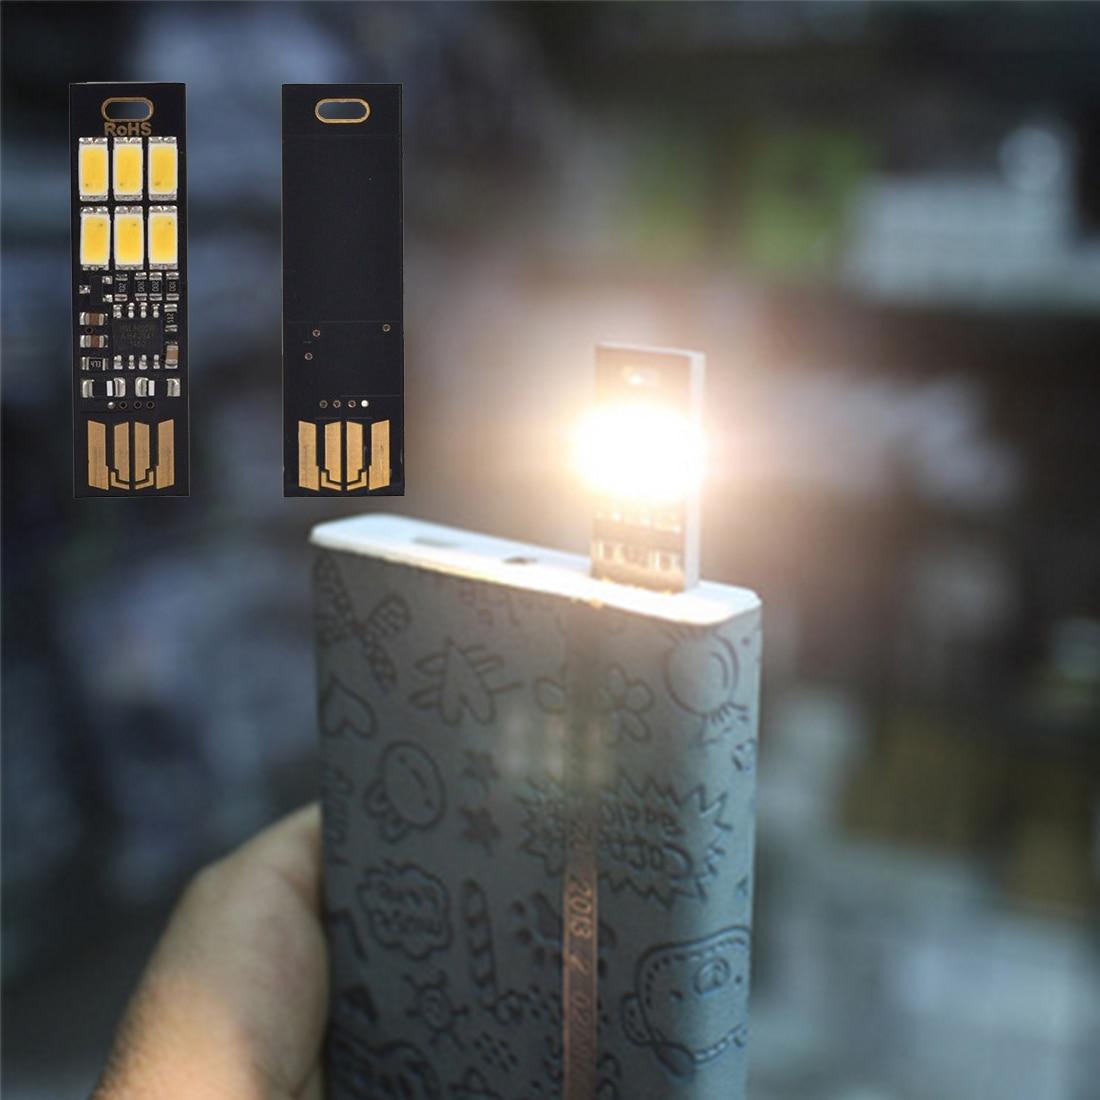 Portable Mini Adjust Brightness 6 LED Night Lights Finger Touch Lamp Dimmer Pocket Card USB Power For Computer Laptop